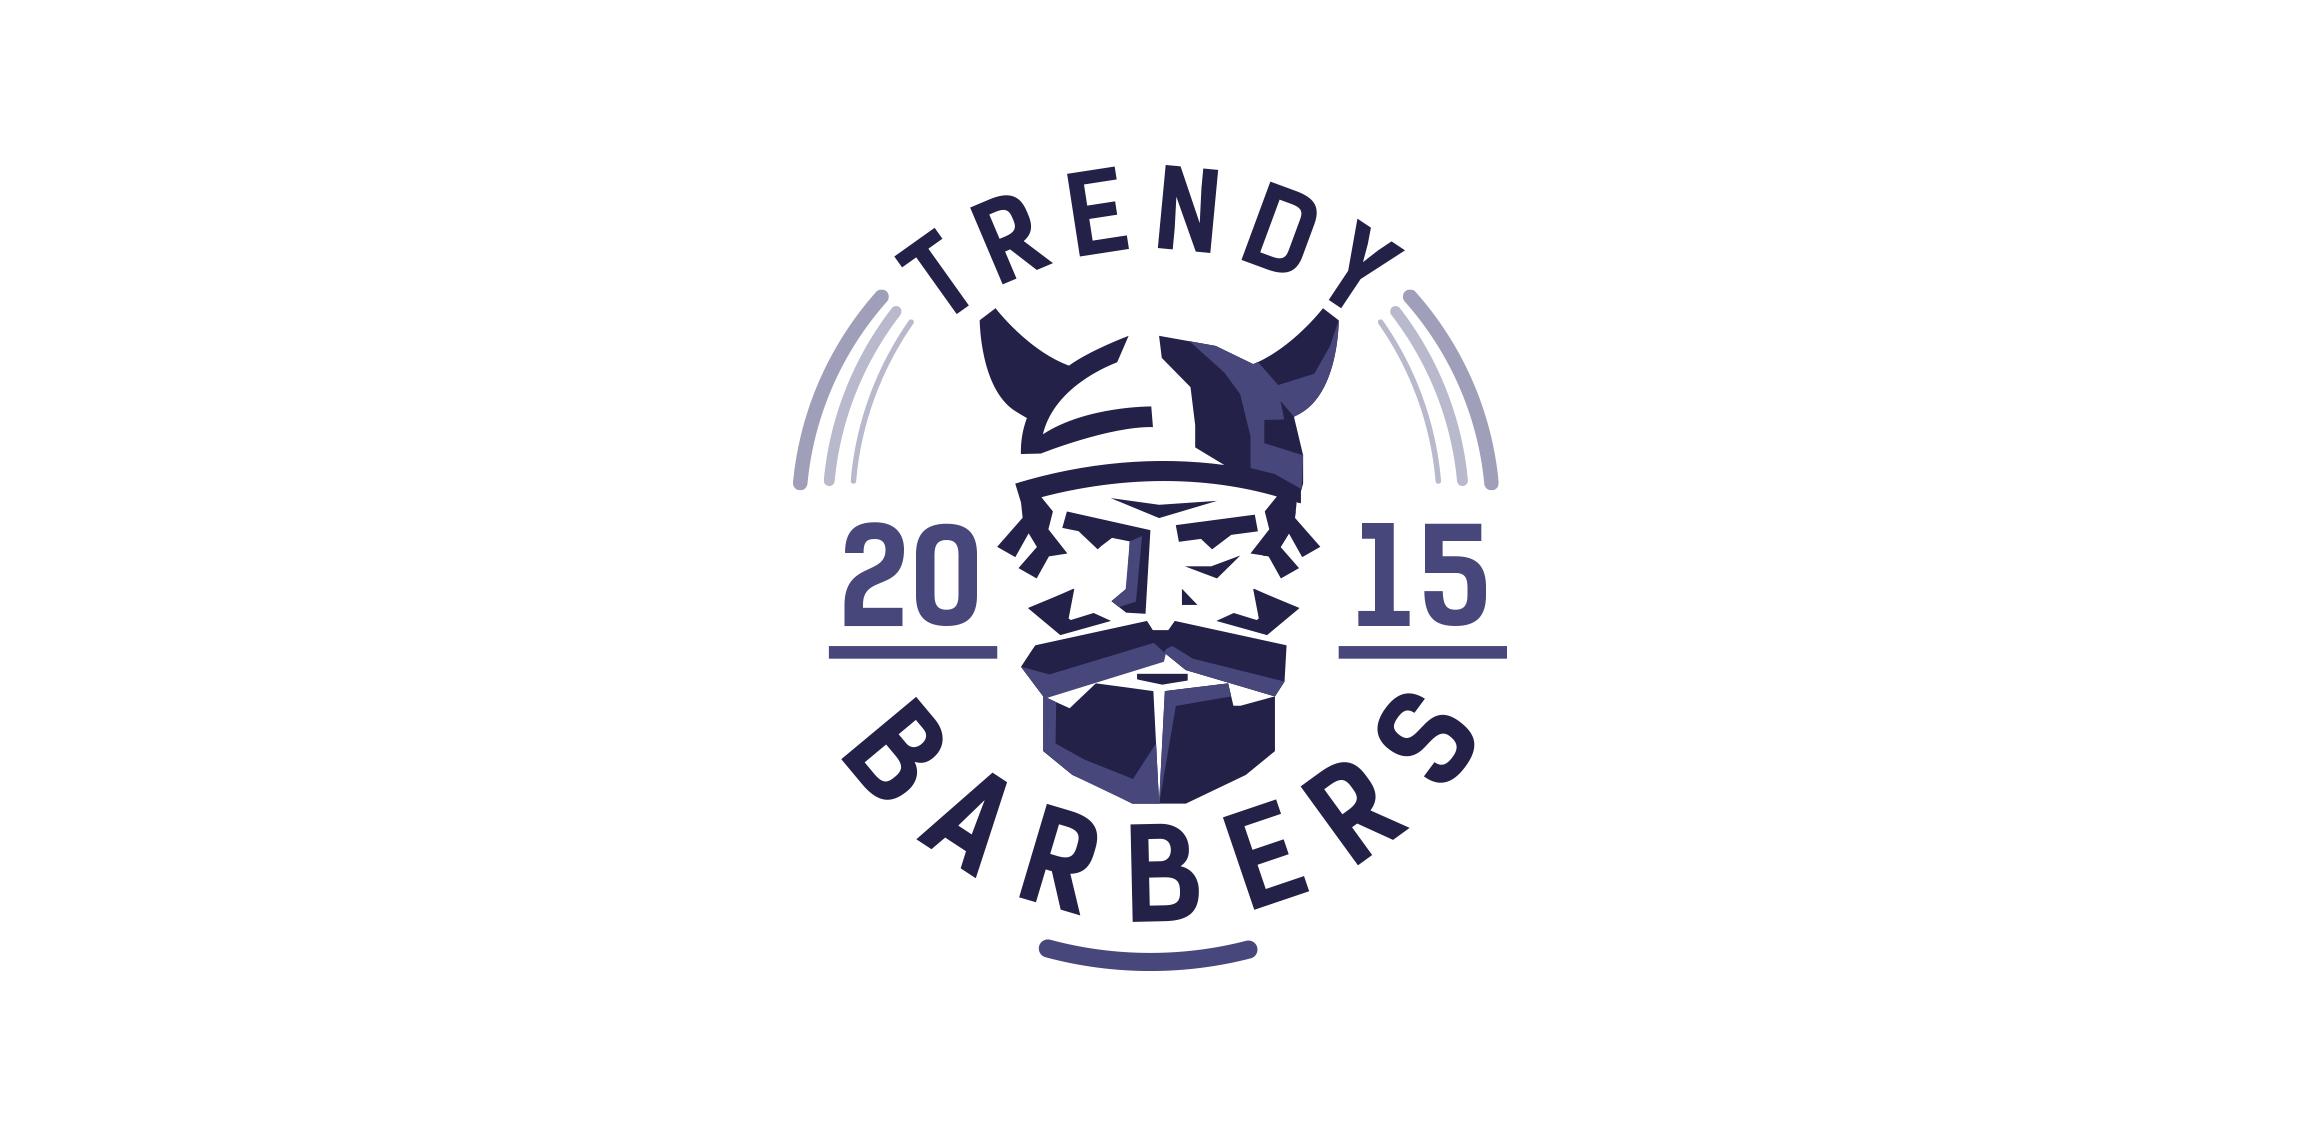 Trendy Barbers